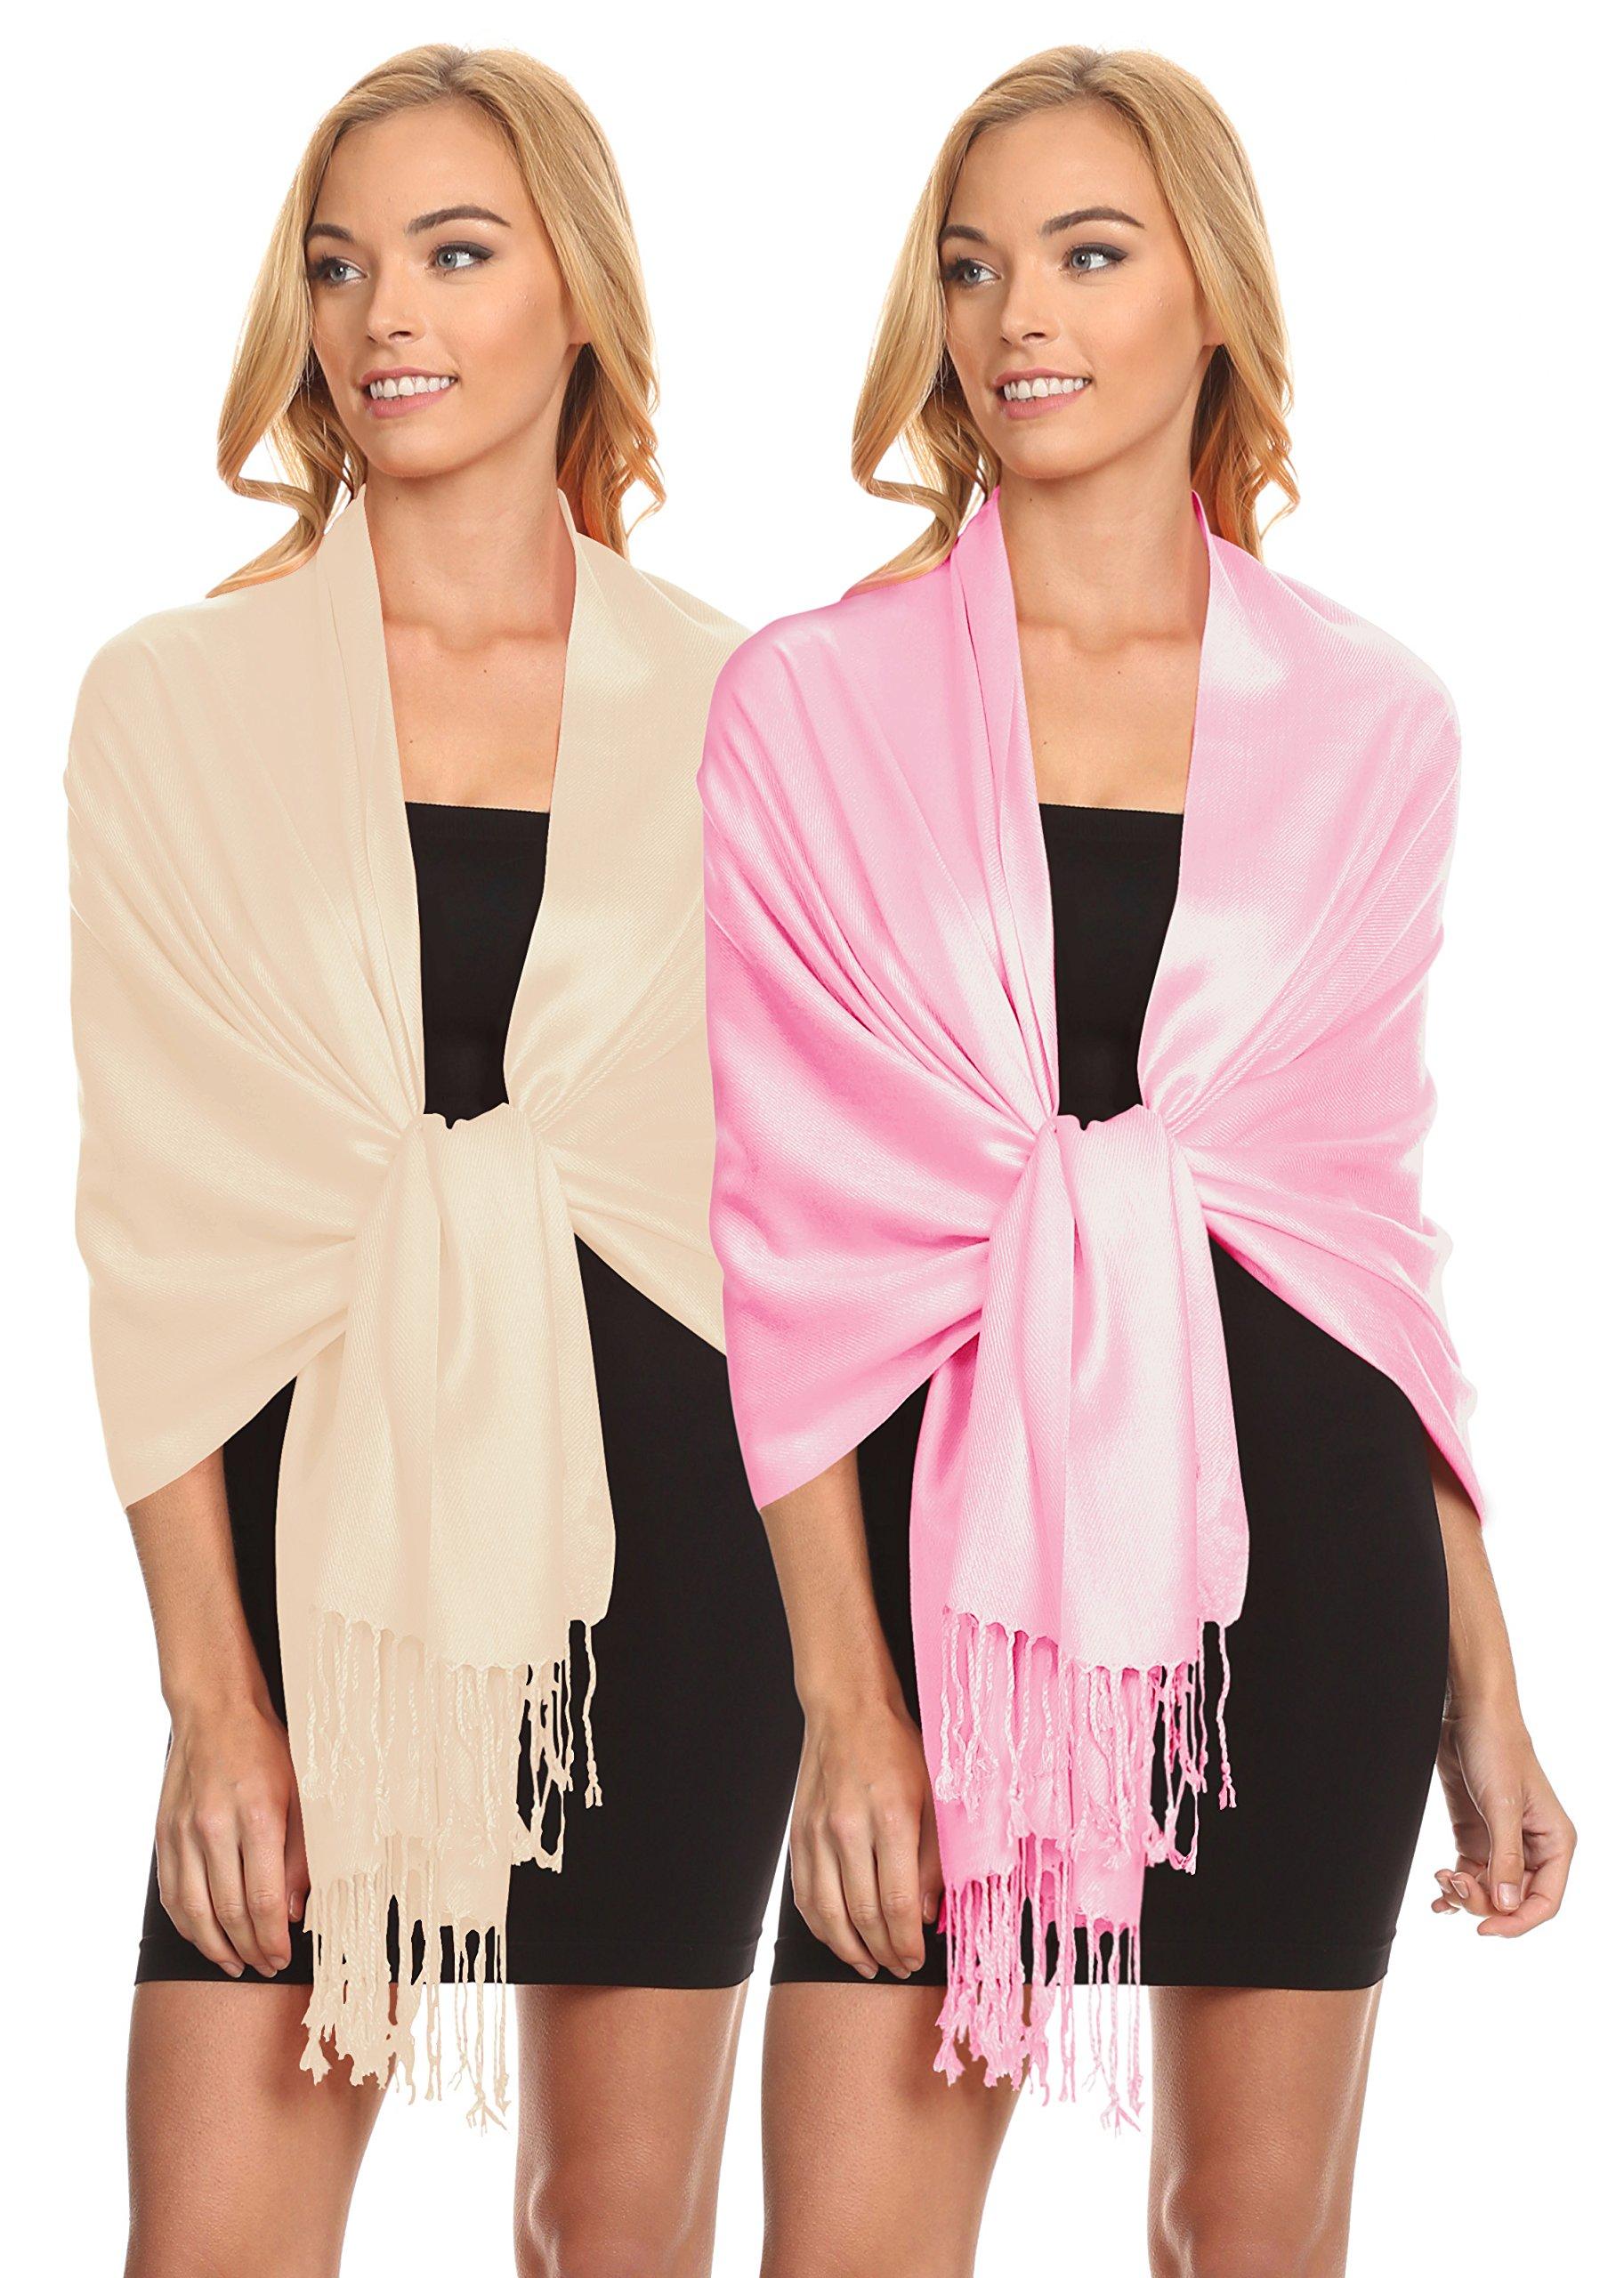 Simlu Womens Scarfs Silky Pashmina Shawl Wrap Scarves for Women Stole Shawls (Size One Size, 2 Pk Beige/Baby Pink)